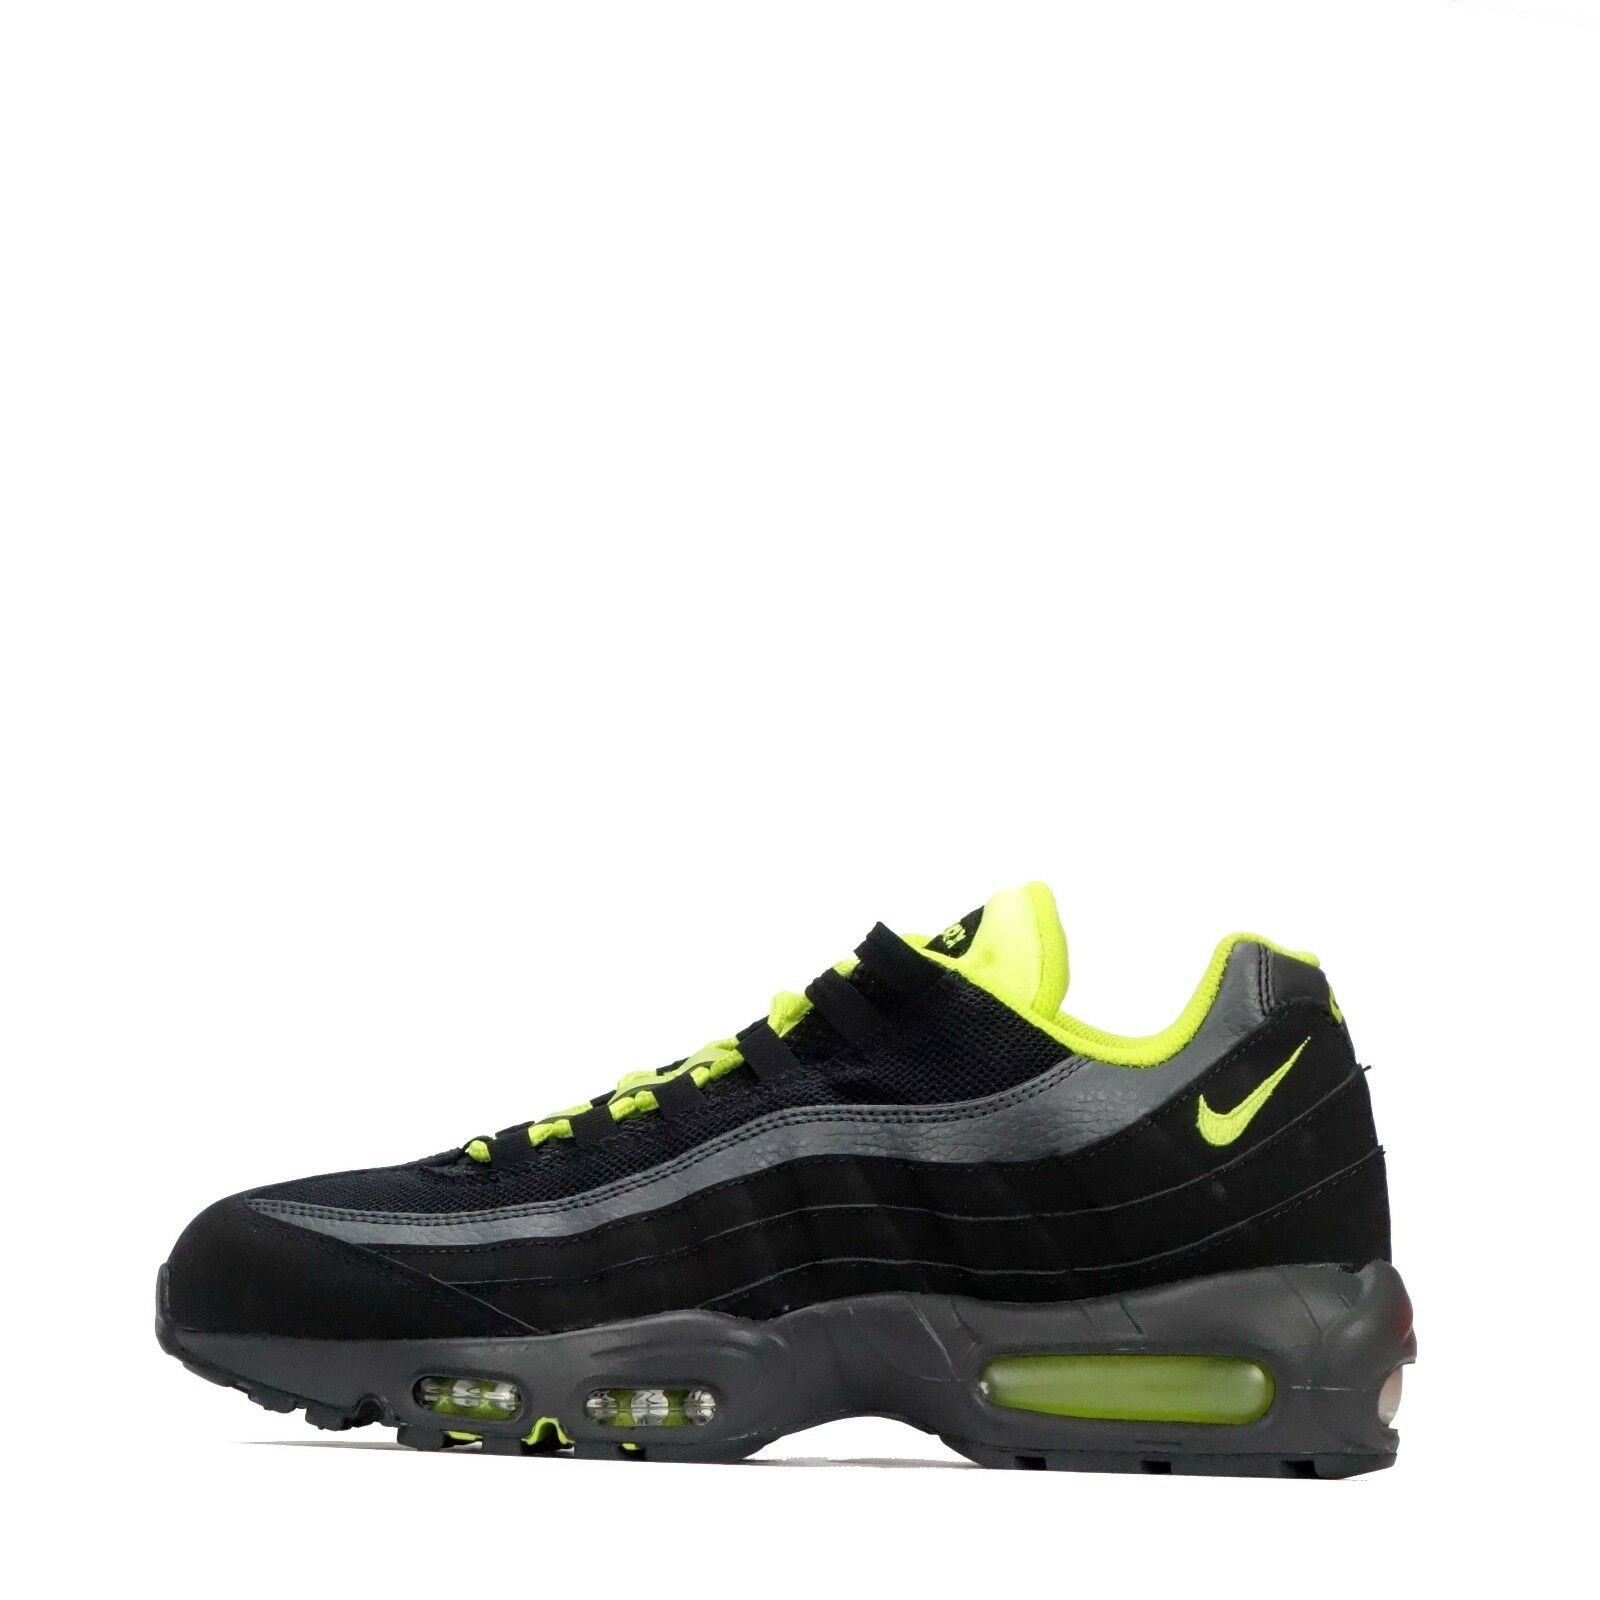 82c910660e11f Air Max 95 SI Men's Black/Venom Green Odd Pair Nike Shoes nxhpfr4492 ...